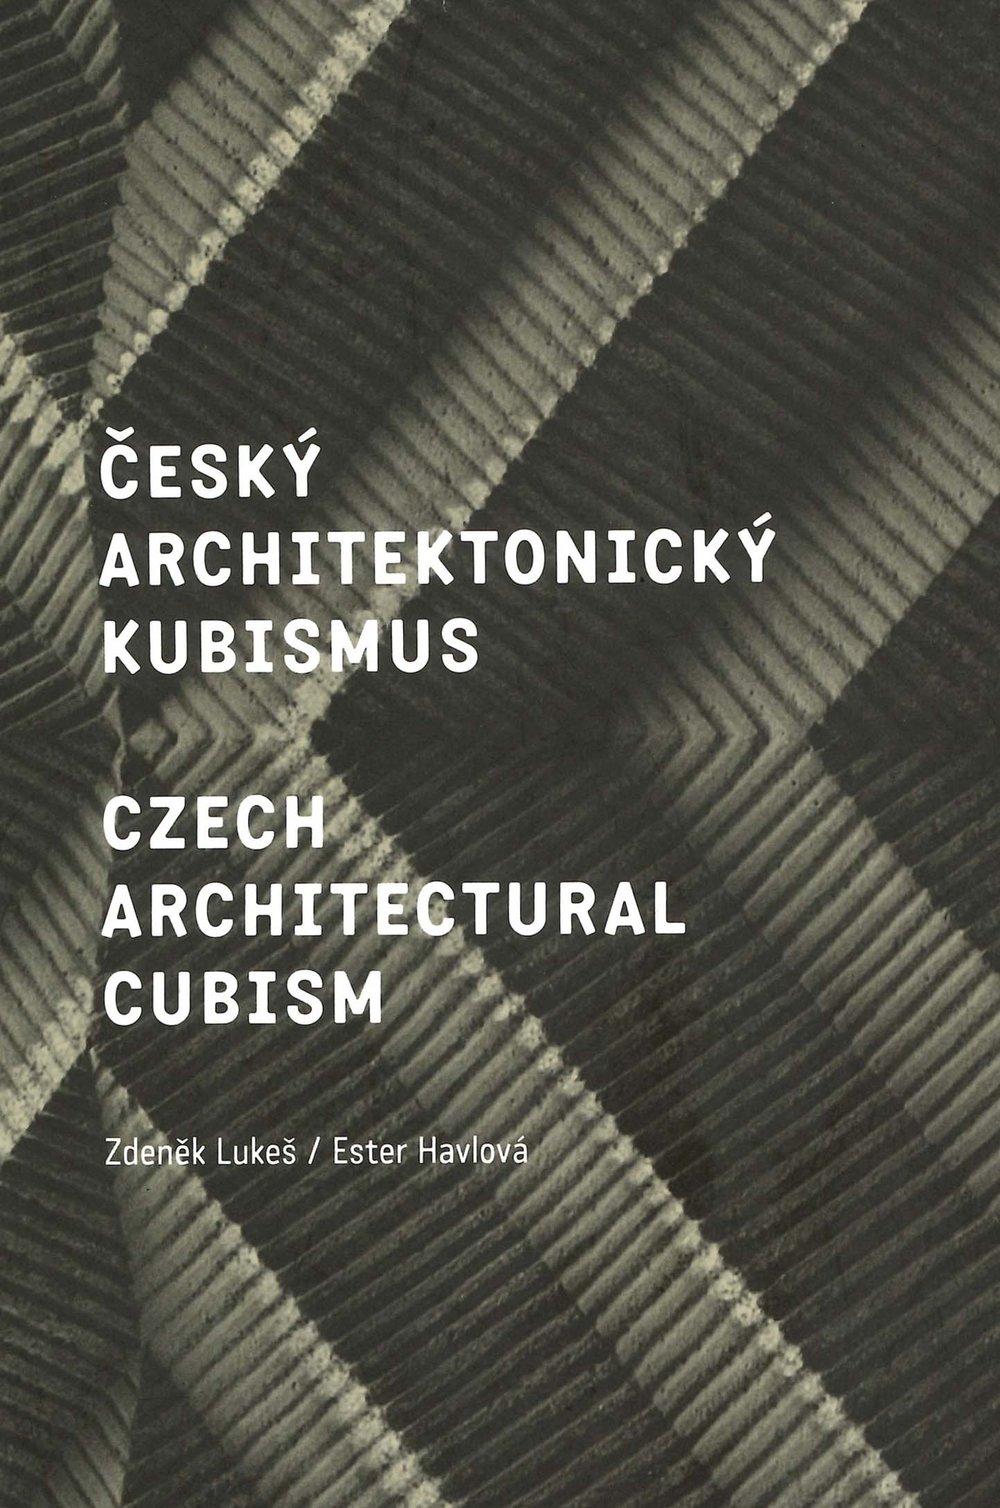 Czech Architectural Cubism.jpg